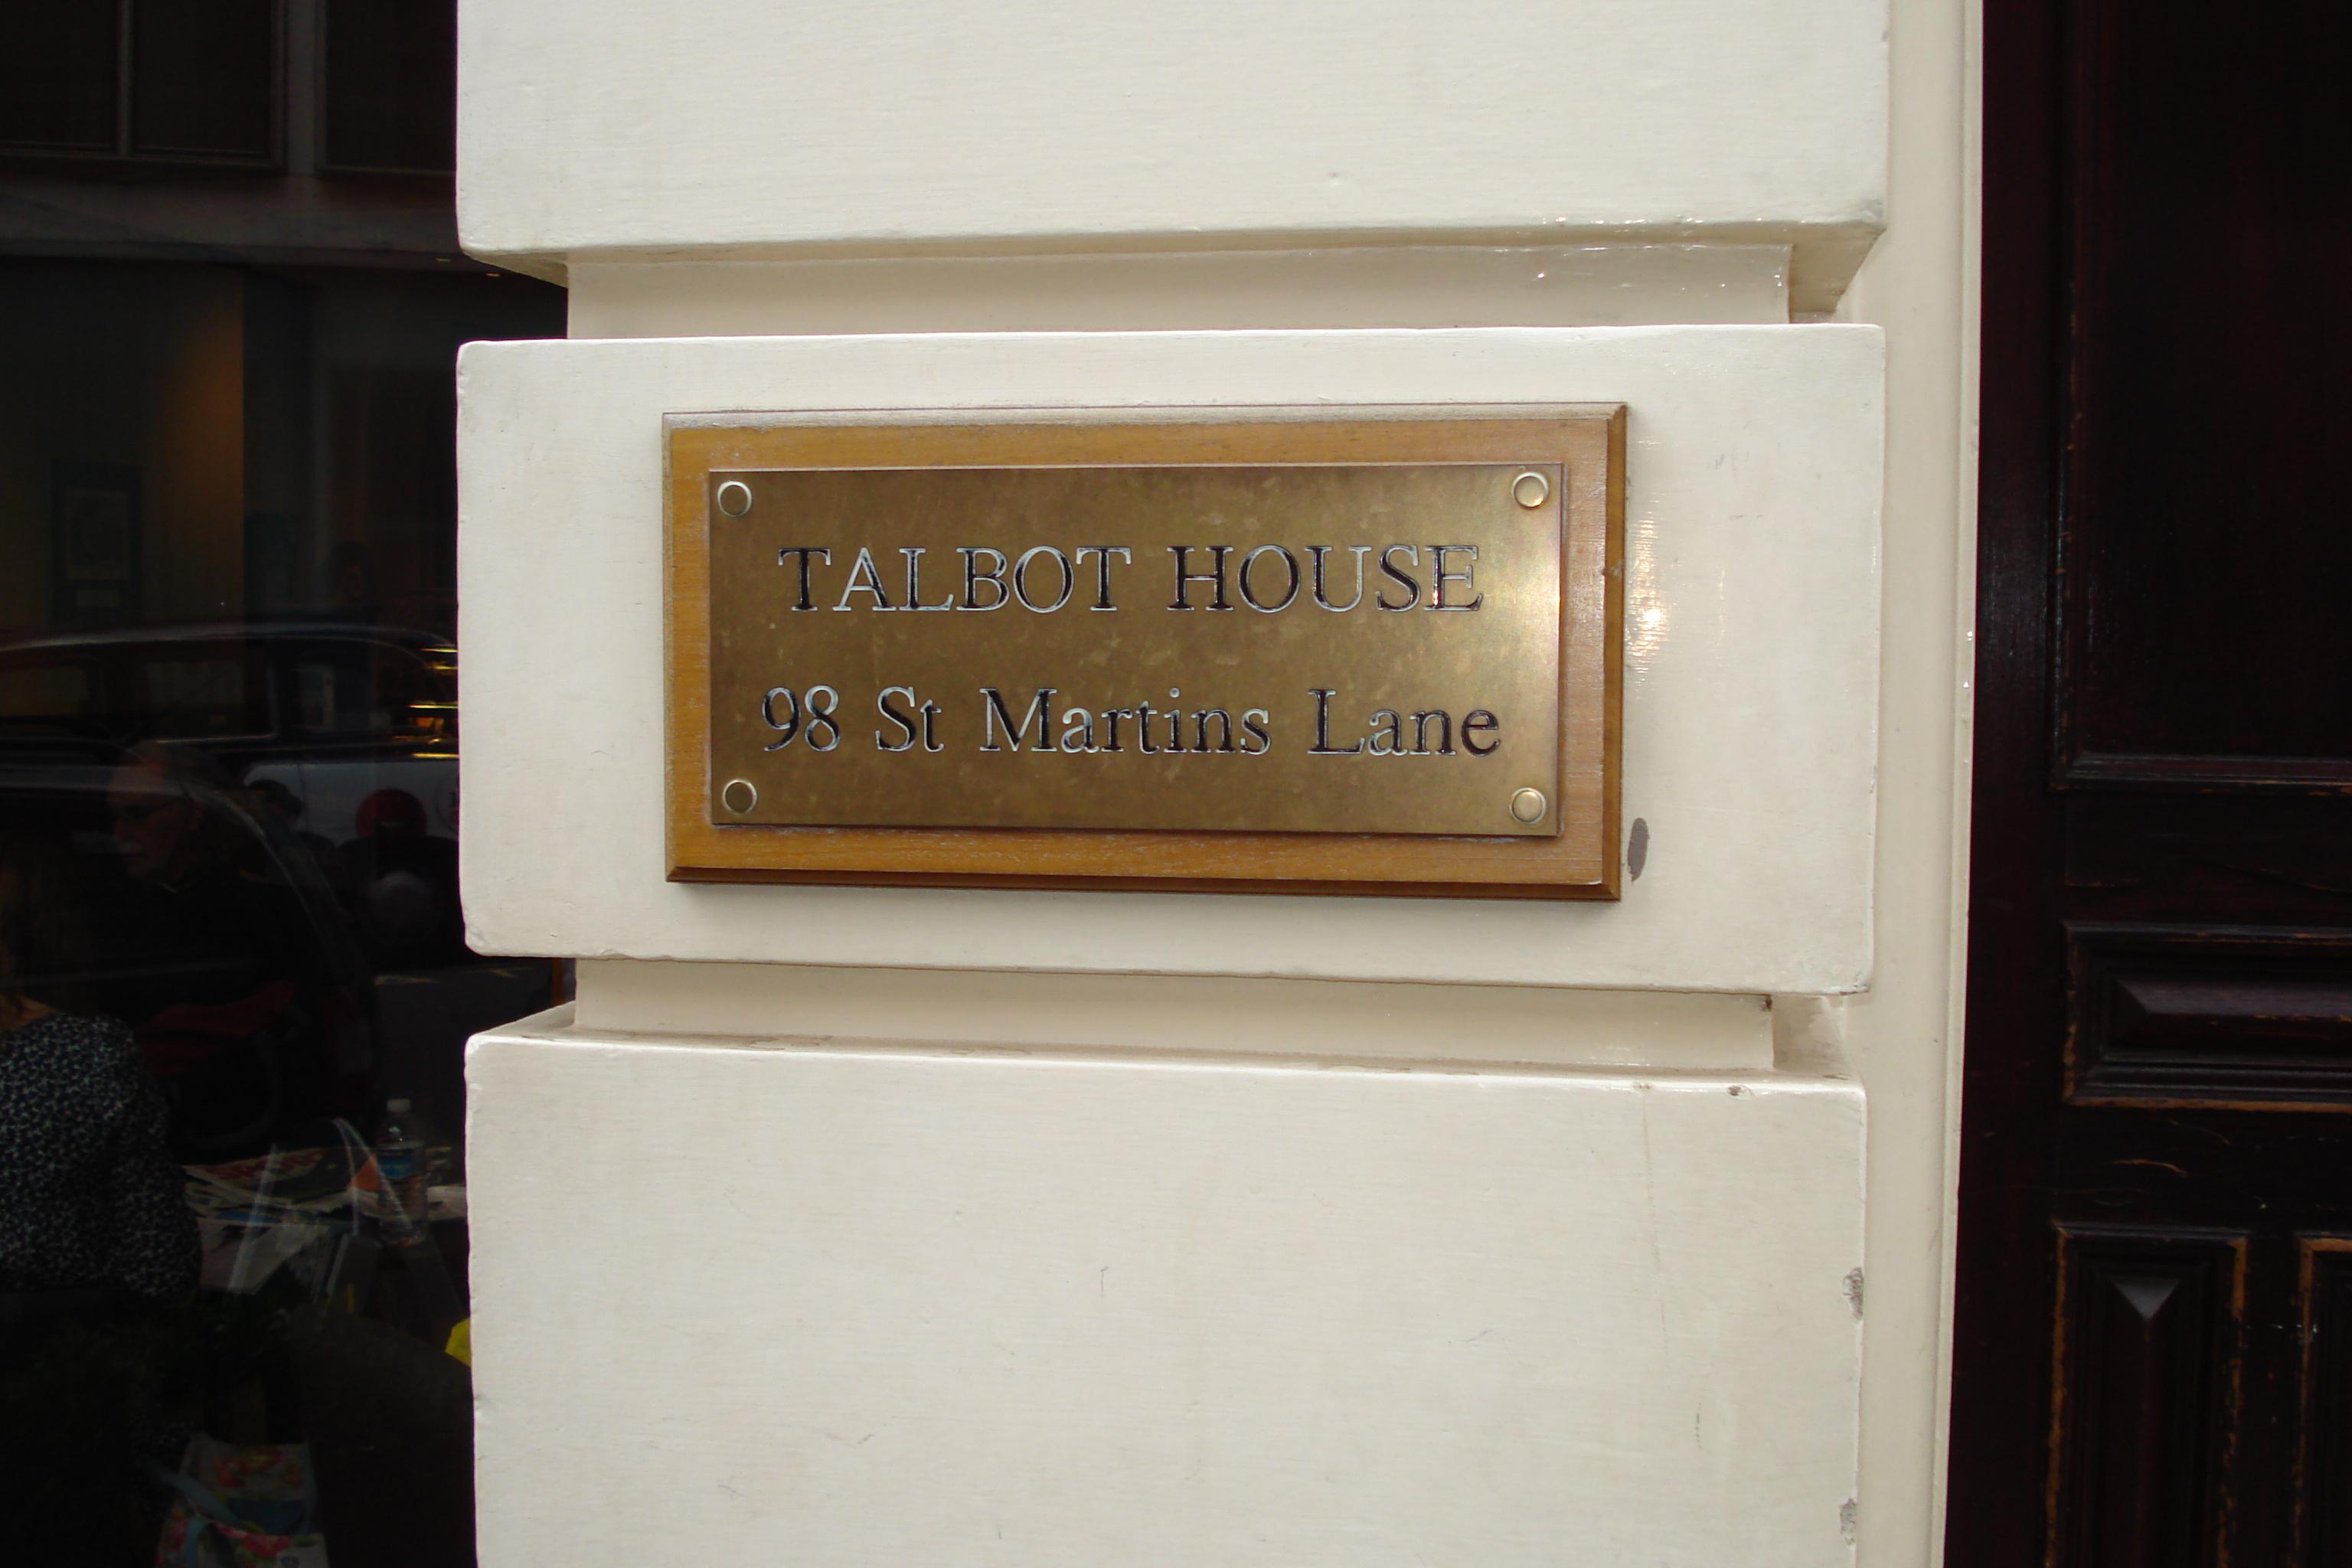 TRL Talbot House 98 st Martin's Lane